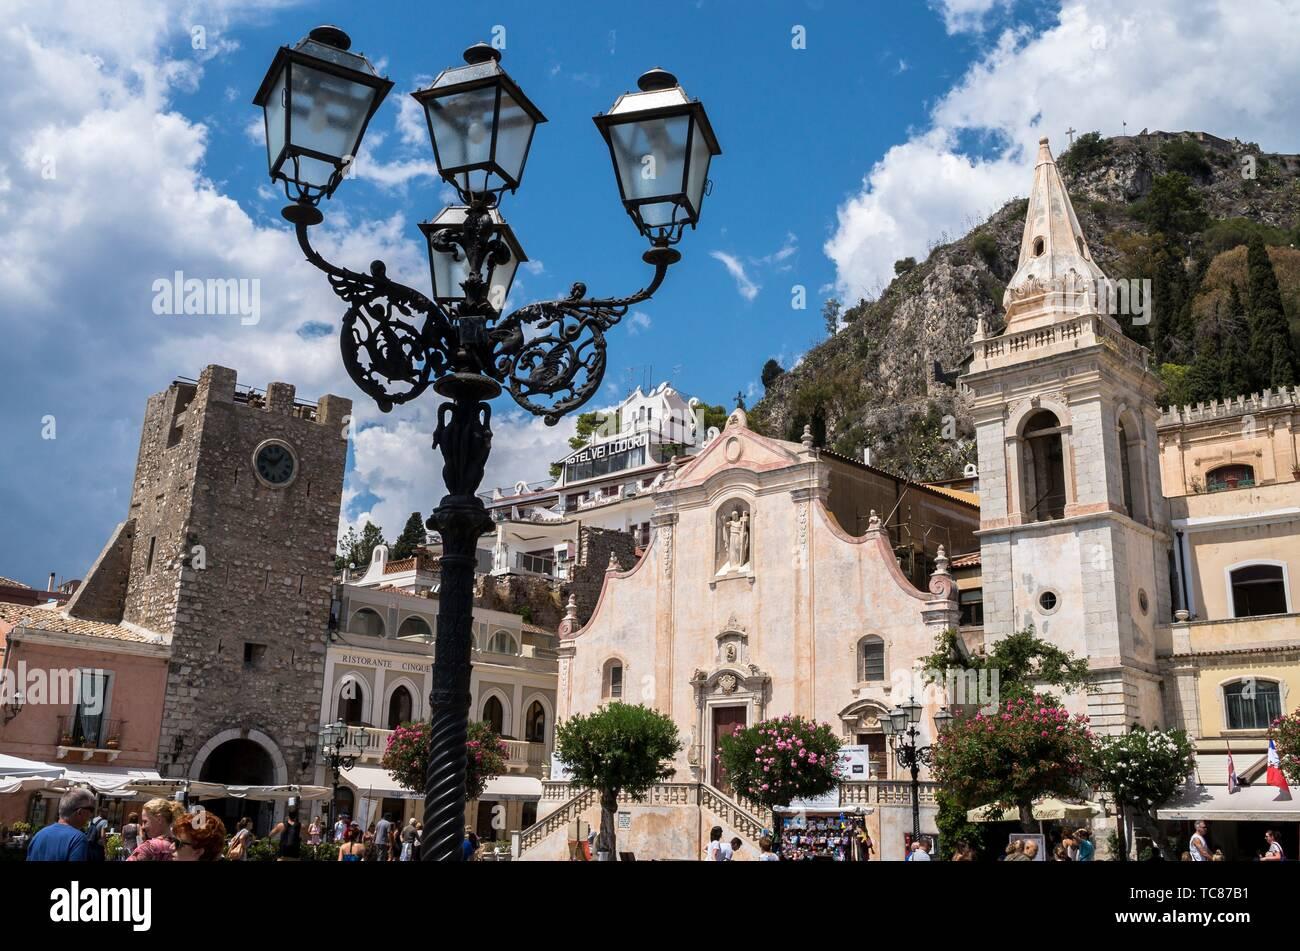 Tower Clock and San Giuseppe church, Taormina, Sicily, Italy. - Stock Image